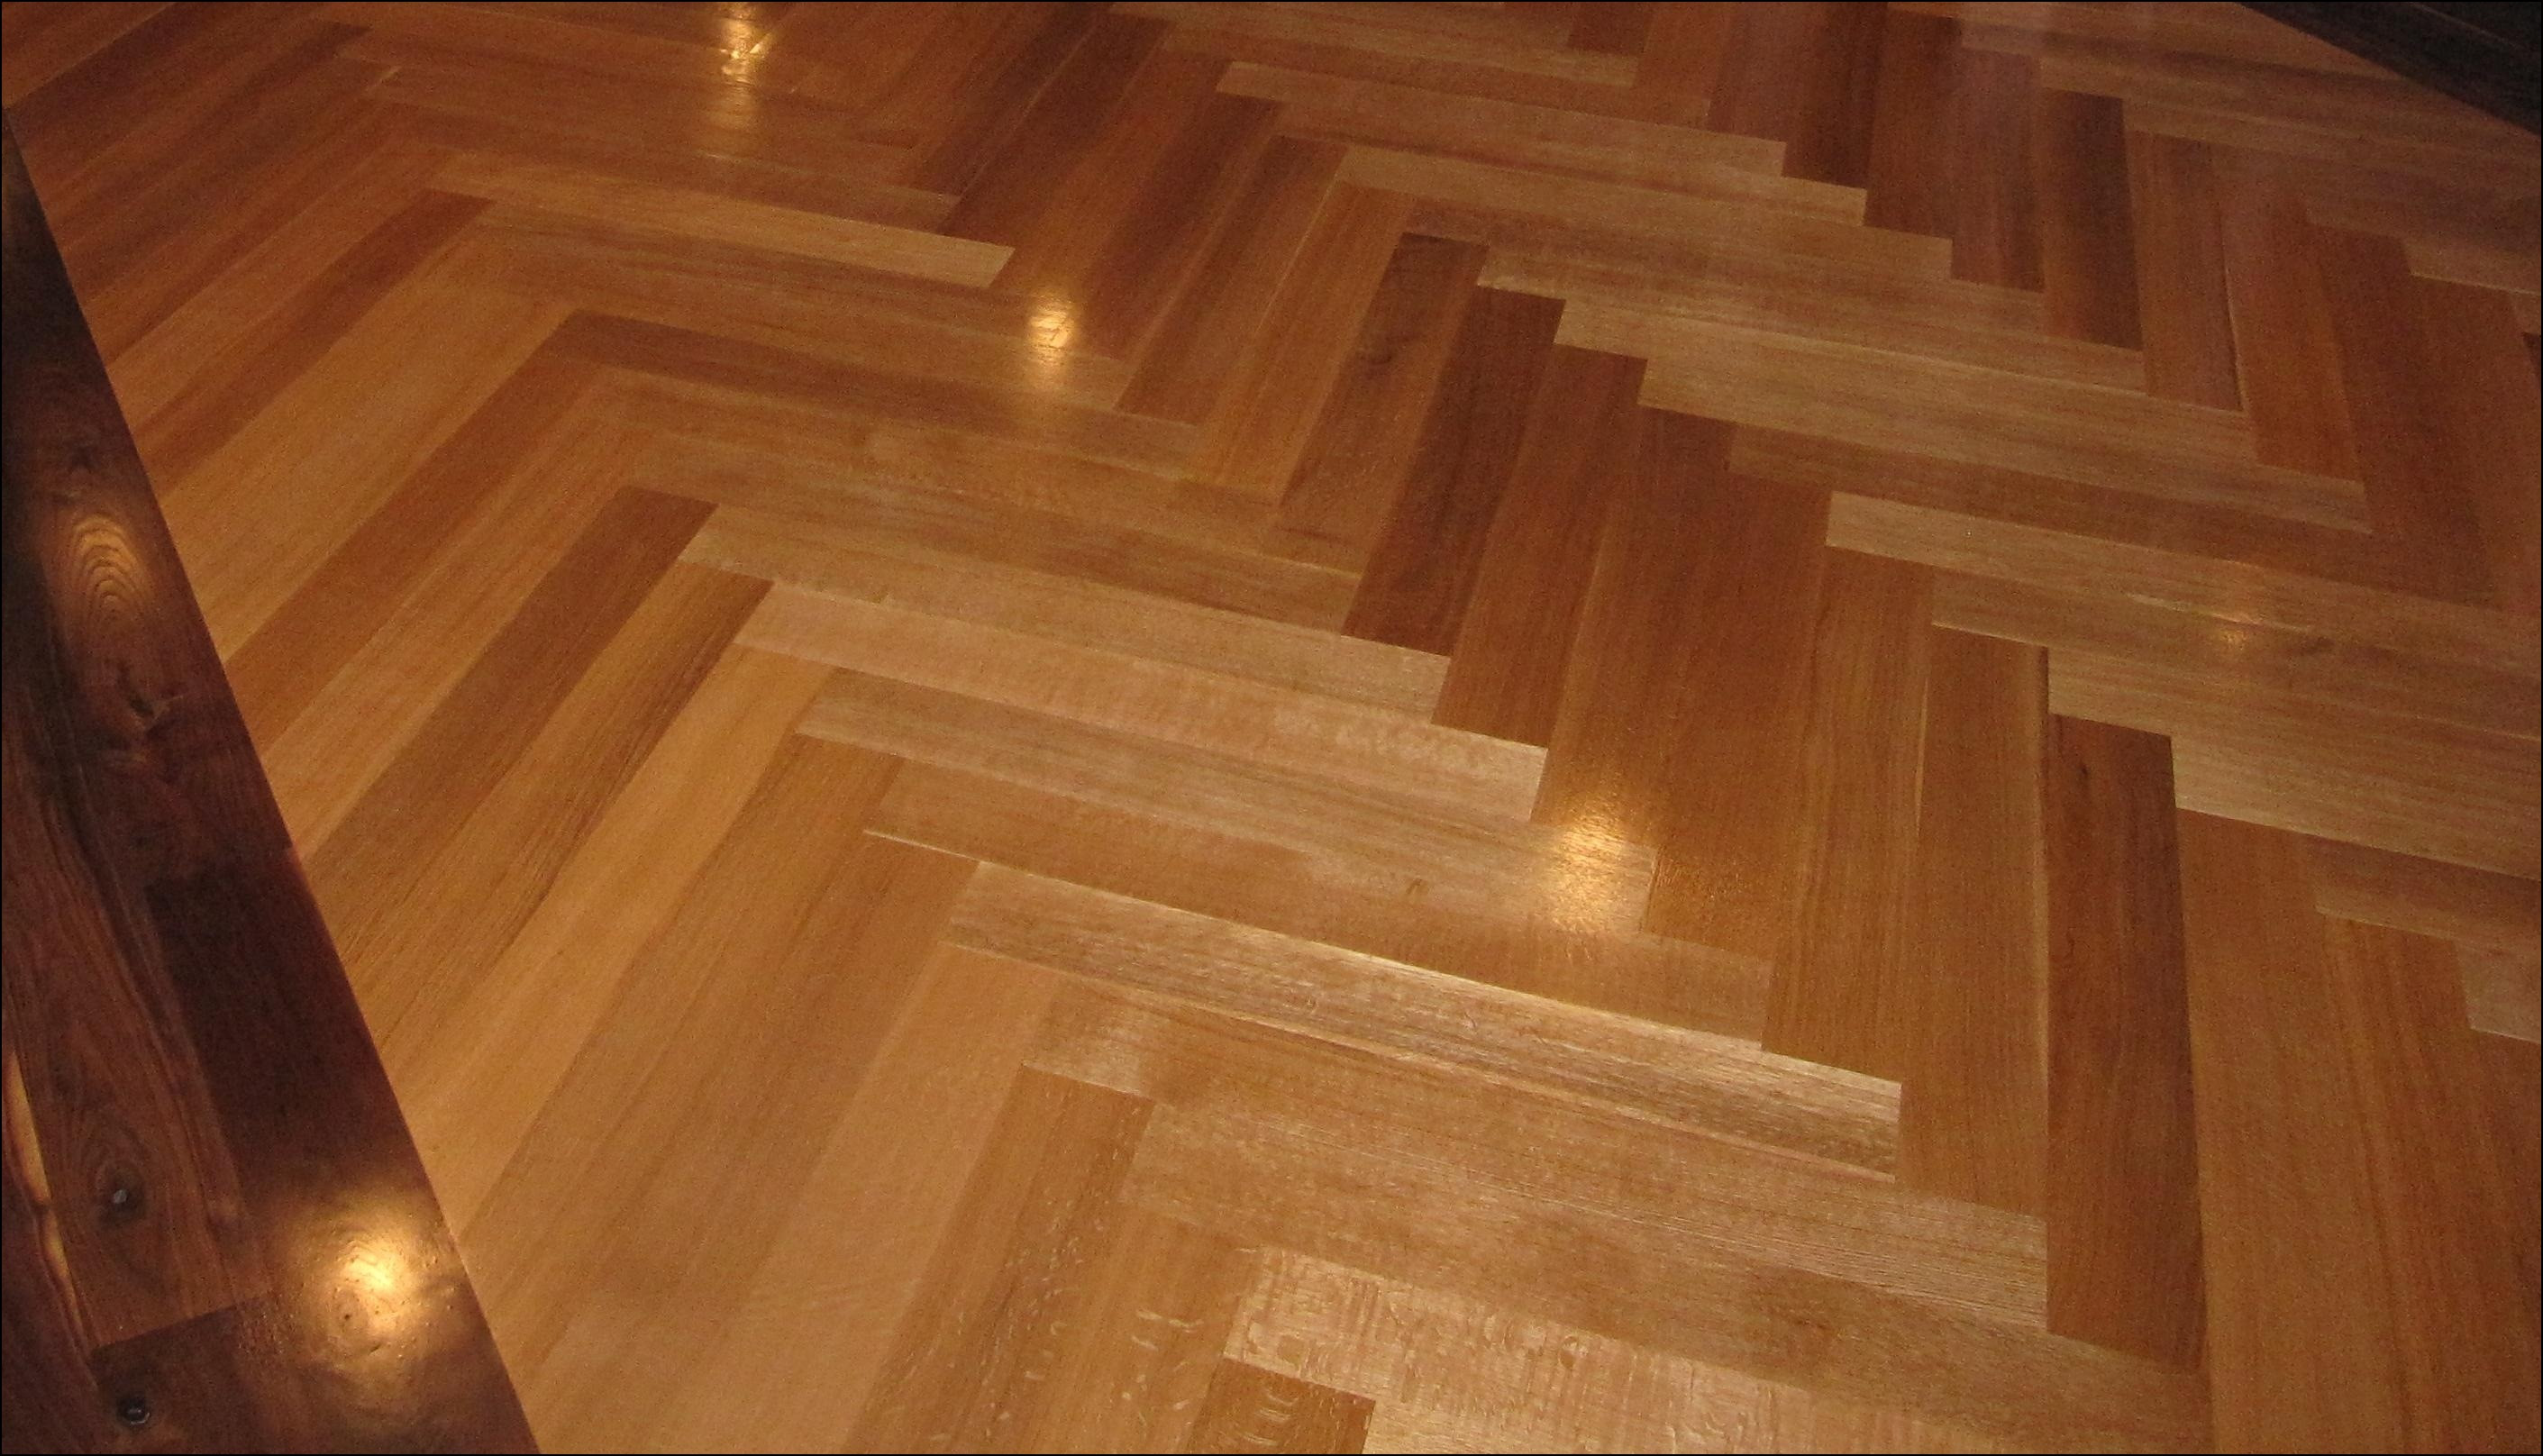 Jasper Prefinished Oak Hardwood Flooring Of Best Place Flooring Ideas with Best Place to Buy Engineered Hardwood Flooring Photographies Engineered Wood Flooring Glueless Of Best Place to